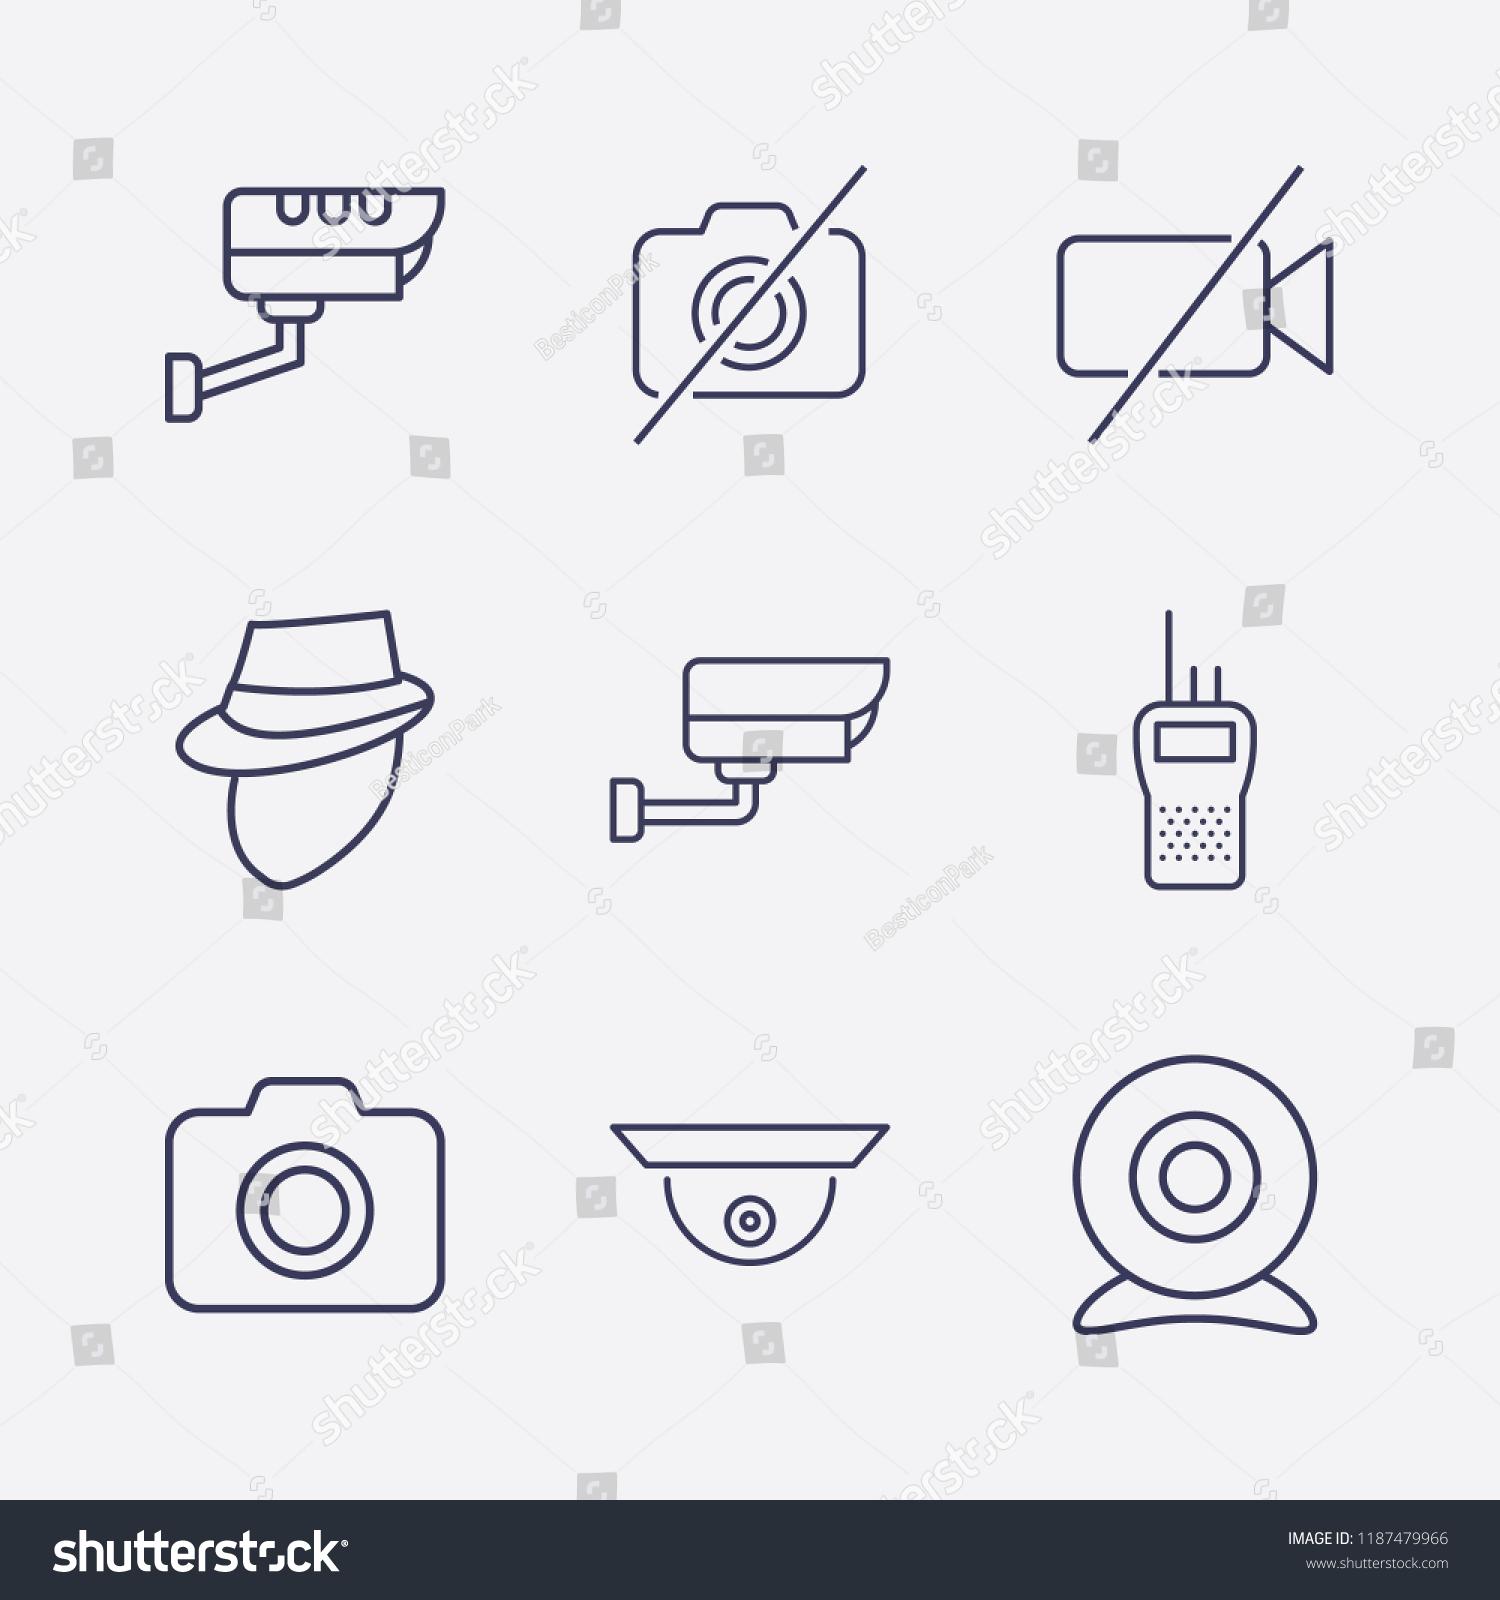 Outline 9 Spy Icon Set Web Stock Vector Royalty Free 1187479966 Circuit Diagram Of Walkie Talkie Camera Forbidden Video